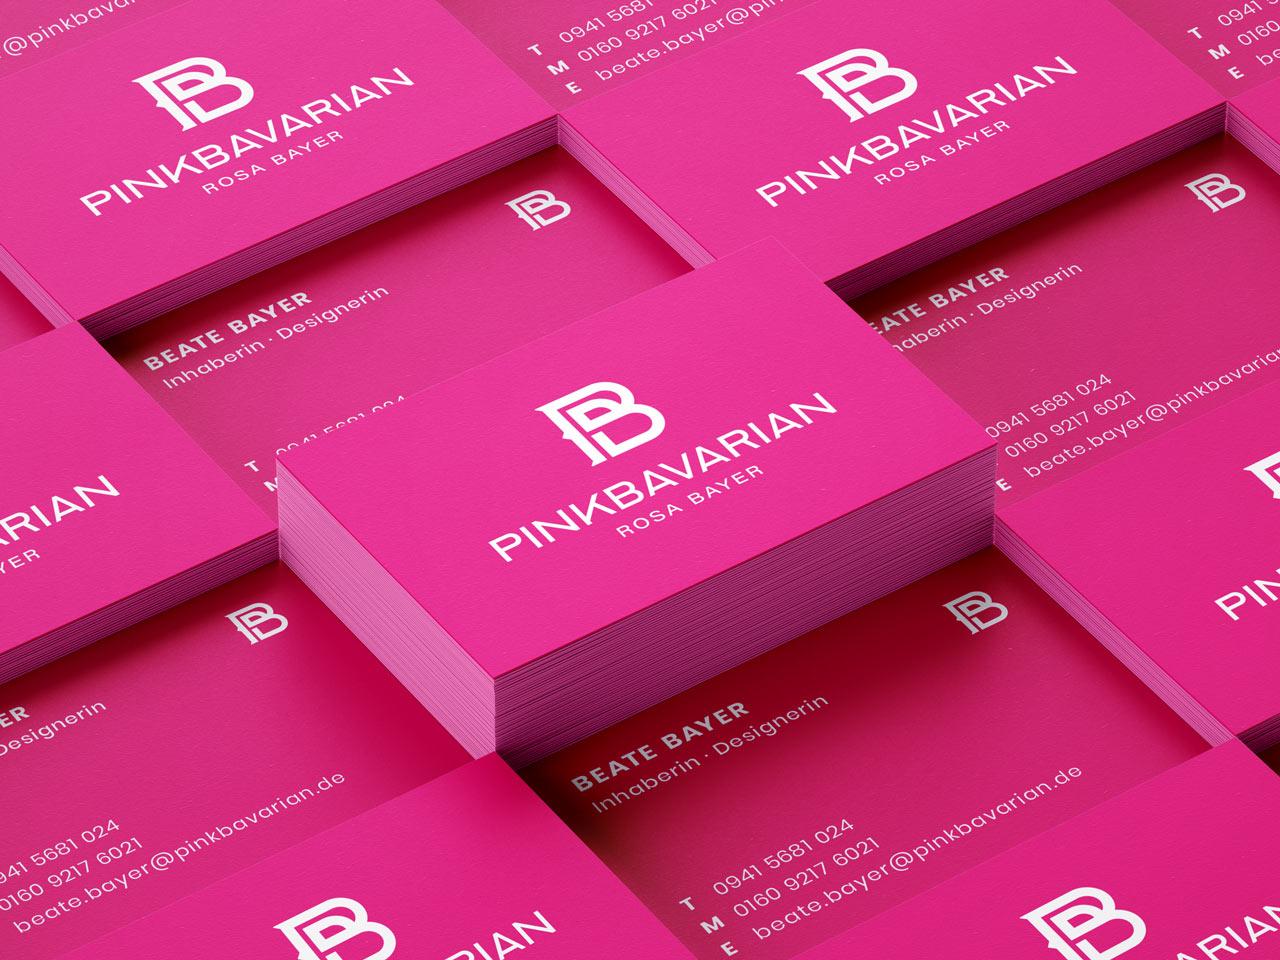 renoarde pinkbavarian branding 001